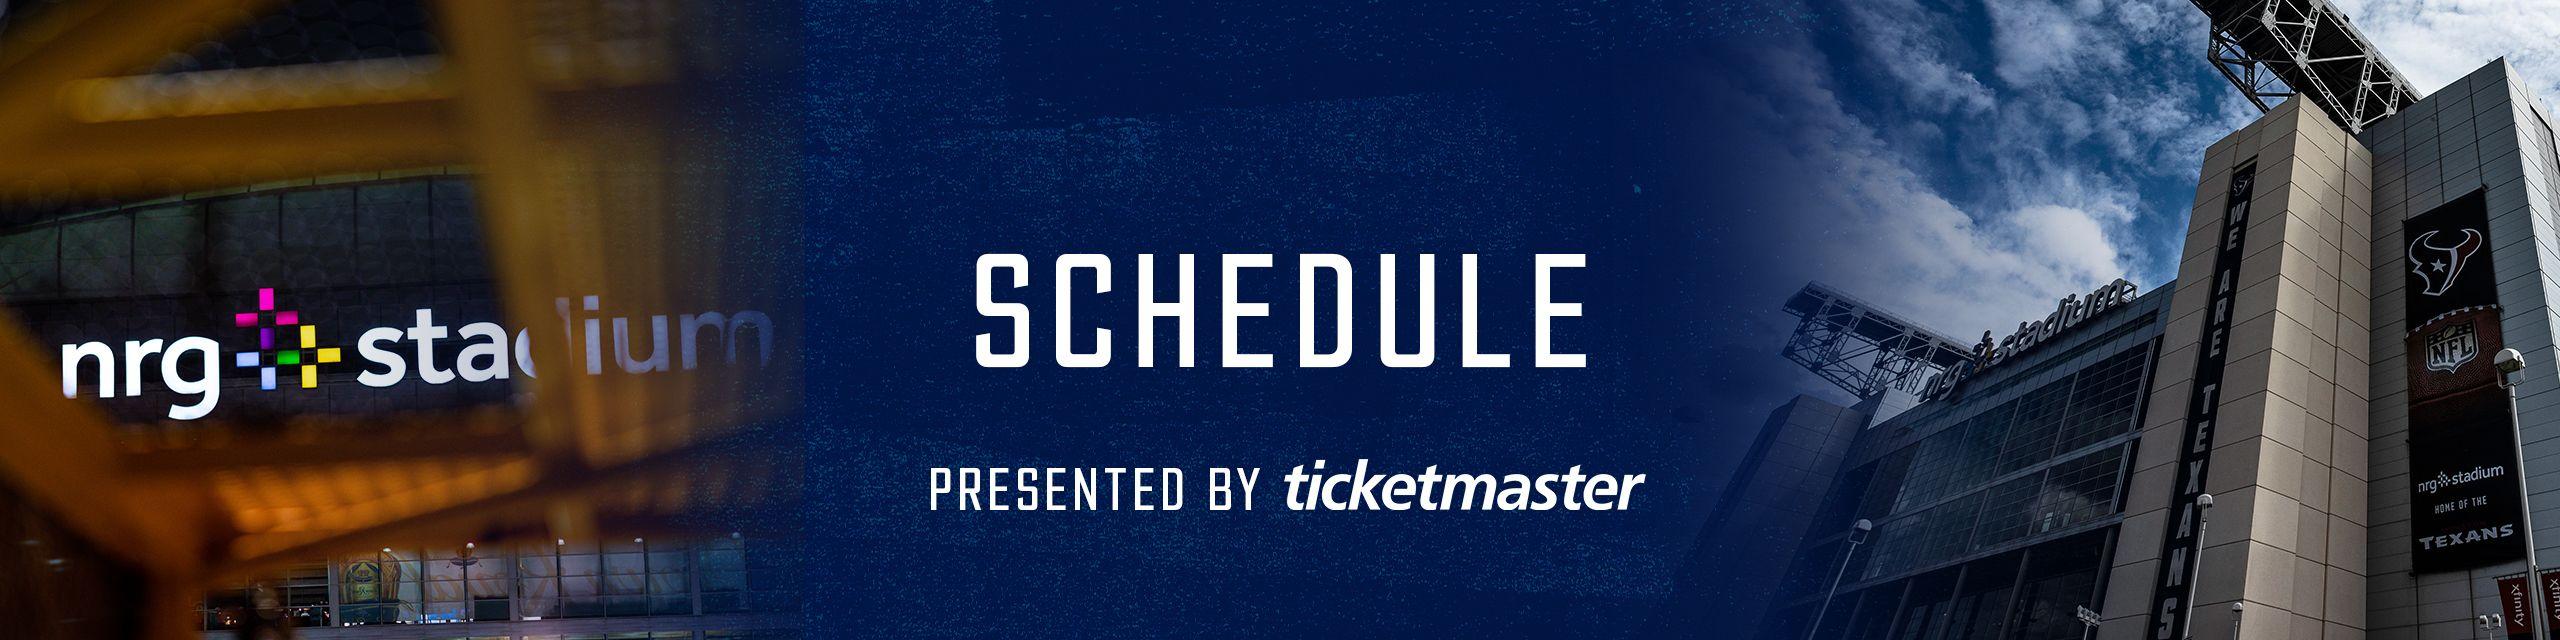 Schedule presented by Ticketmaster